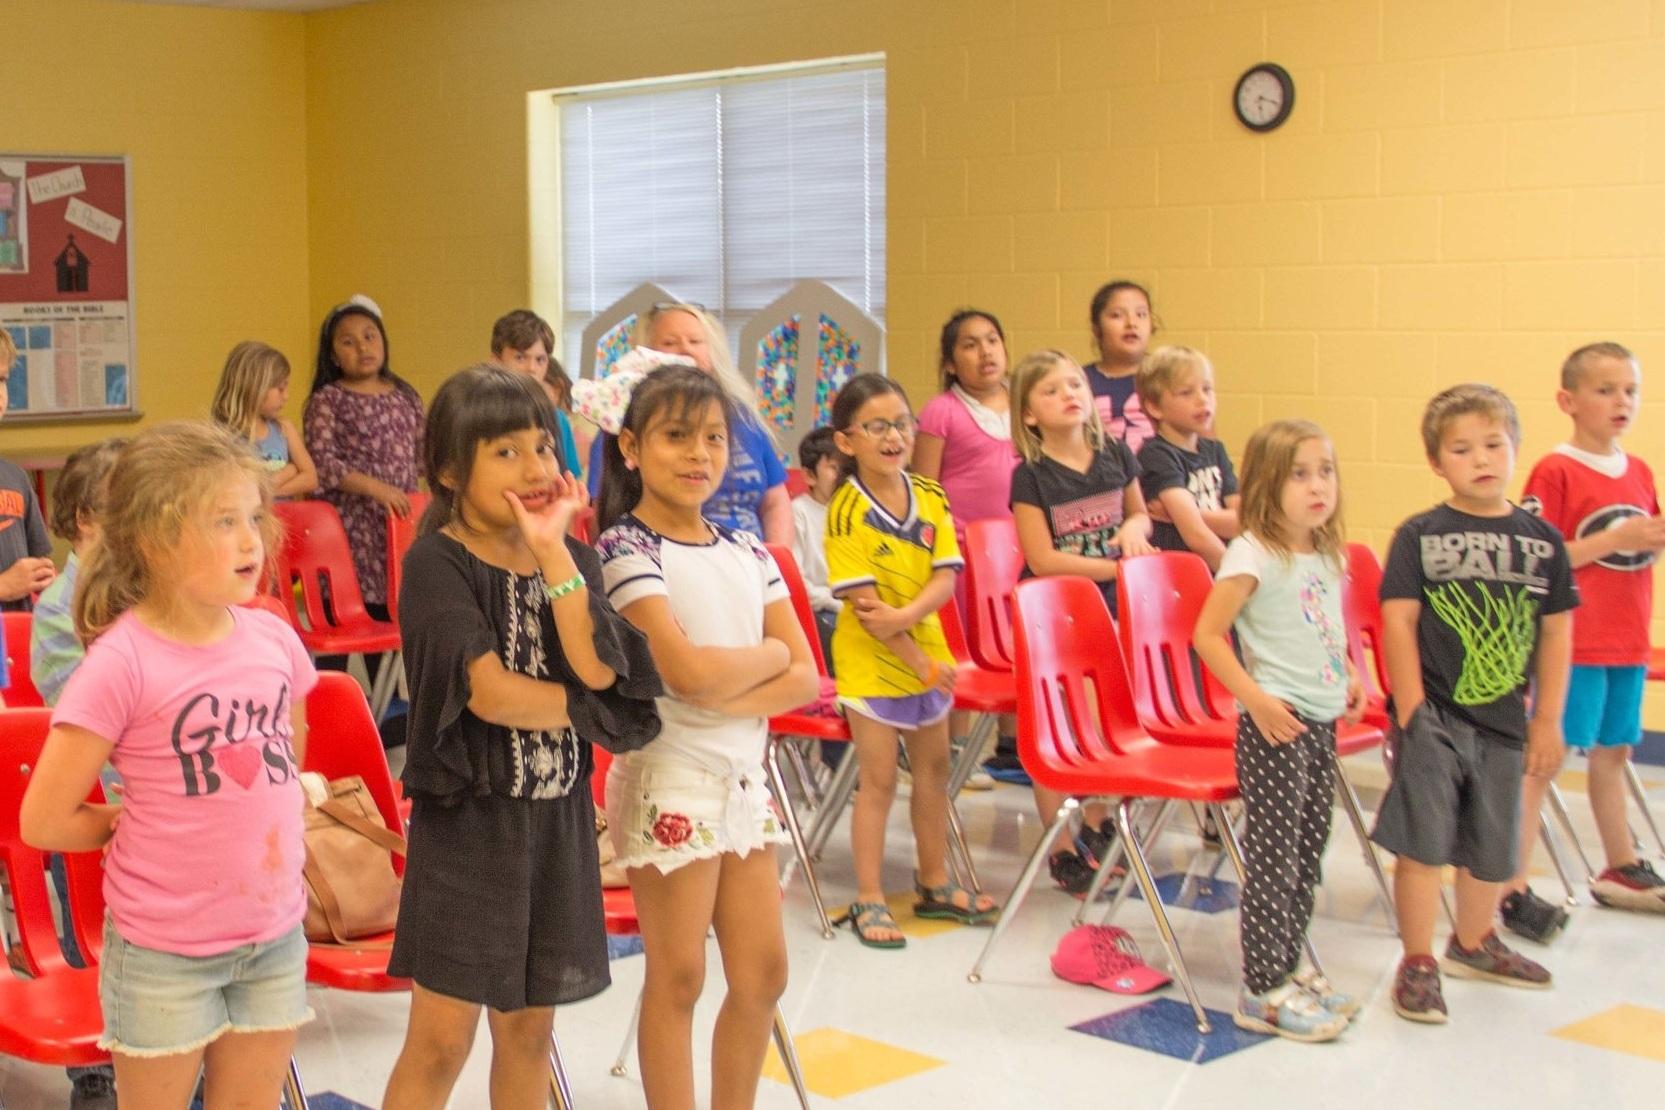 Fundamentals of the Faith- Elementary School - Taught by Tara Solomon